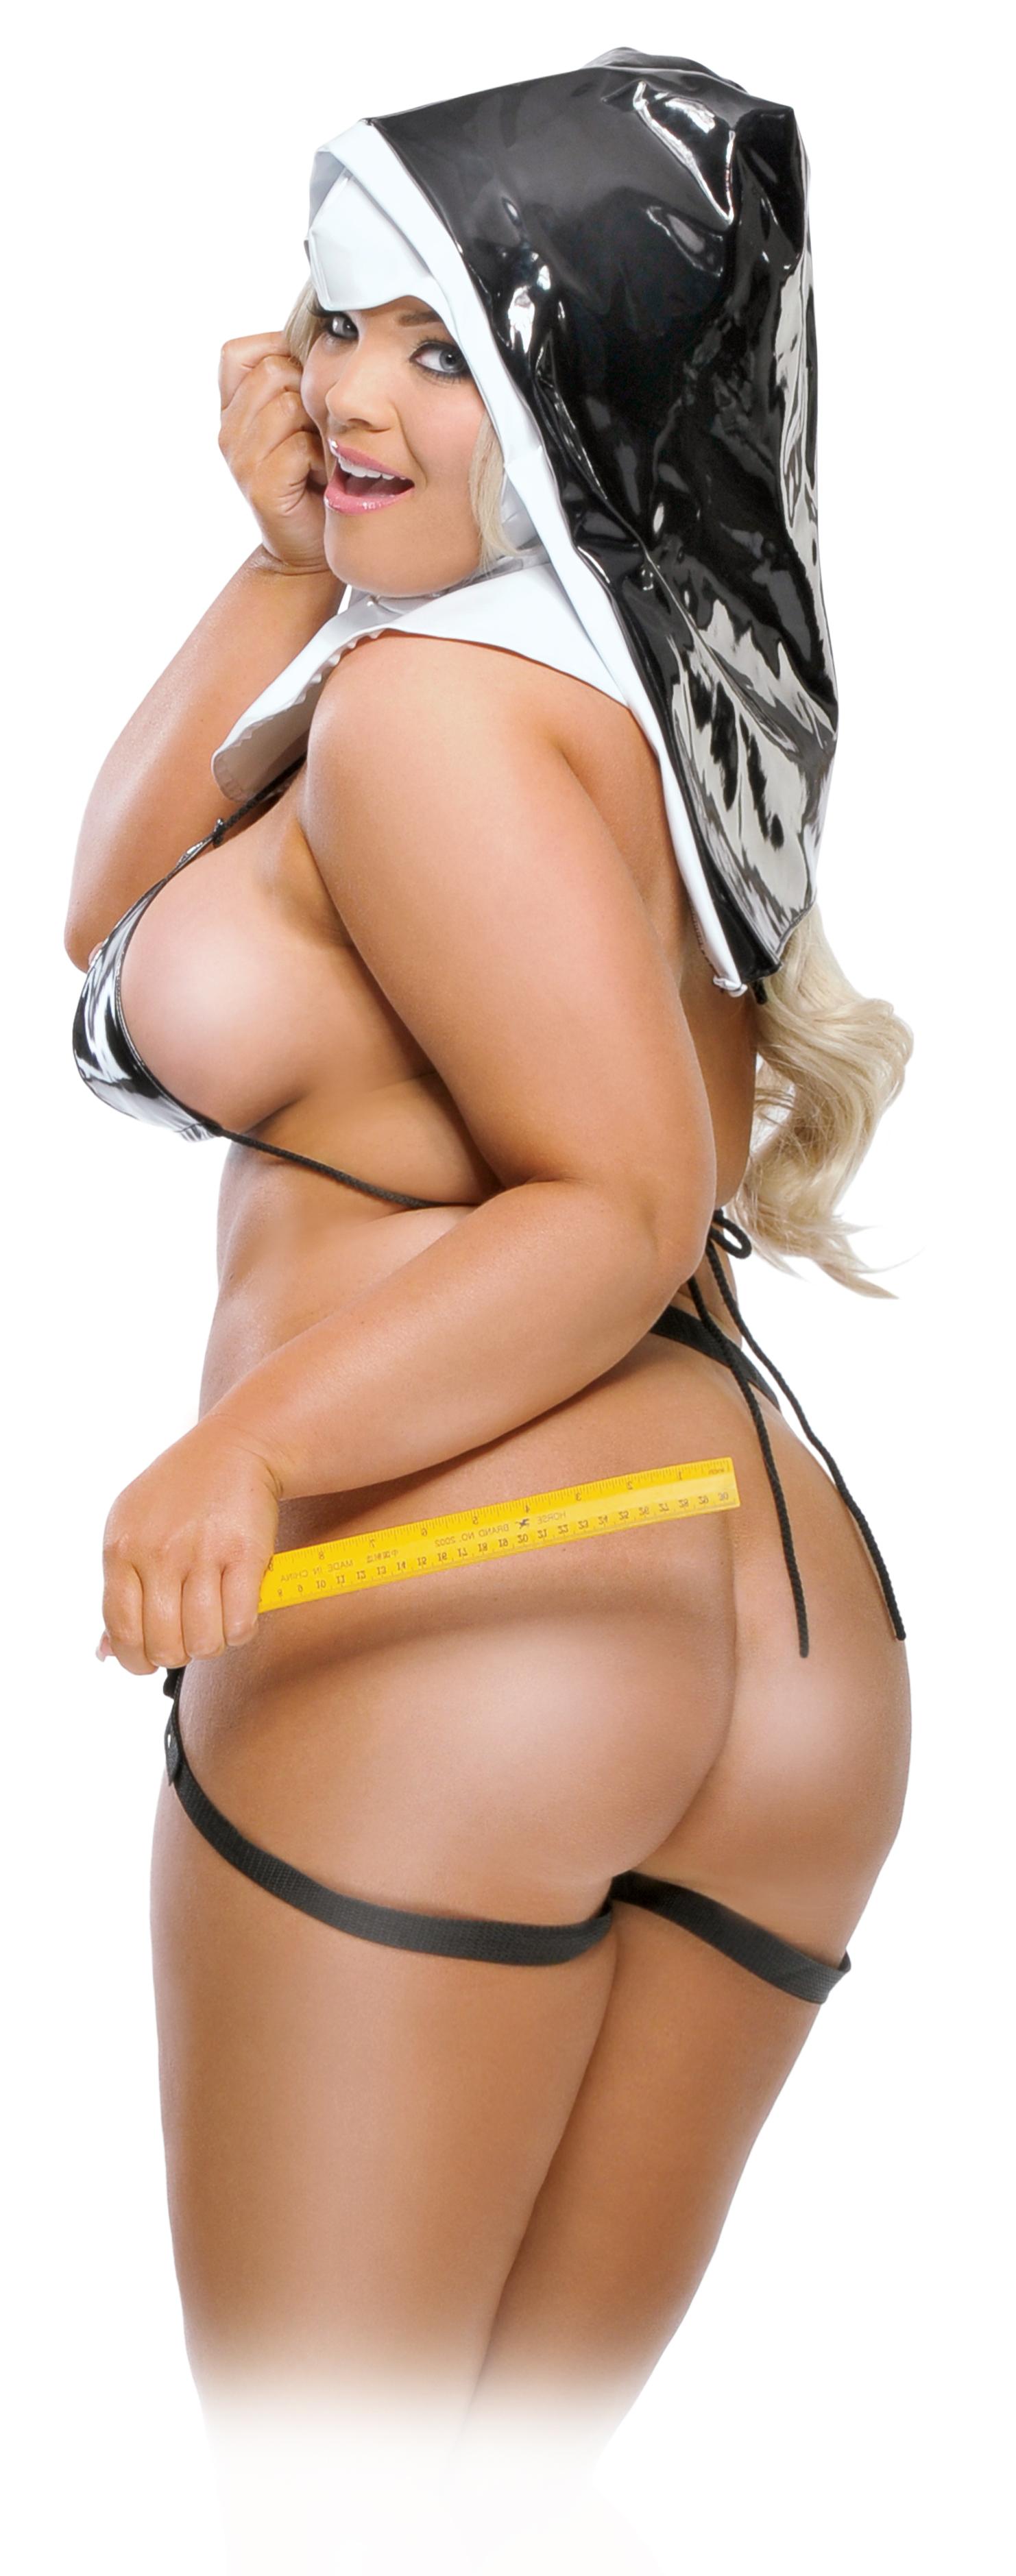 Trisha paytas in magazine naked